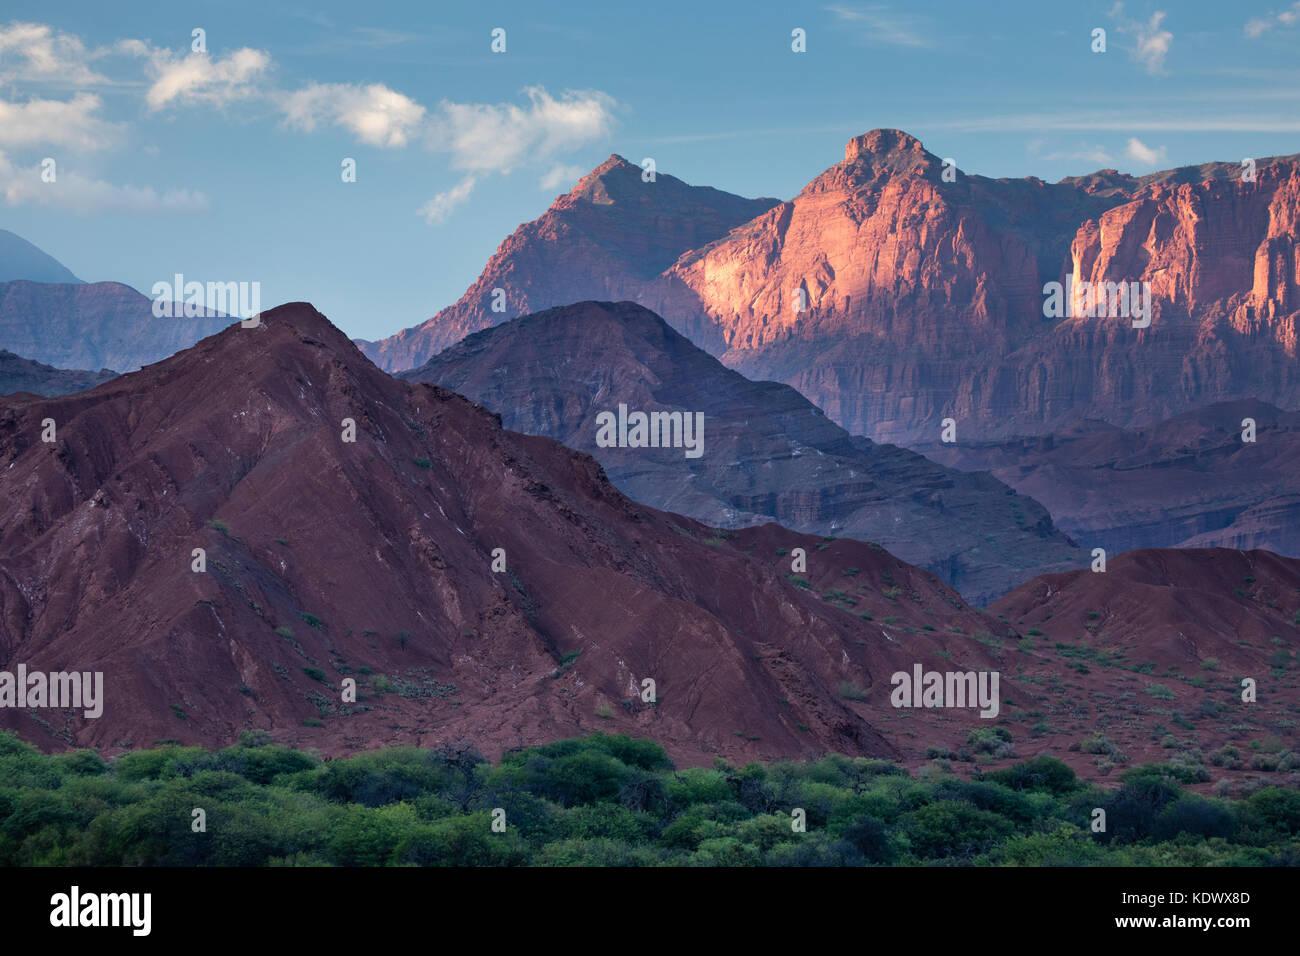 The Quebrada de la Conches, Valles Calchaquies, Salta Province, Argentina - Stock Image